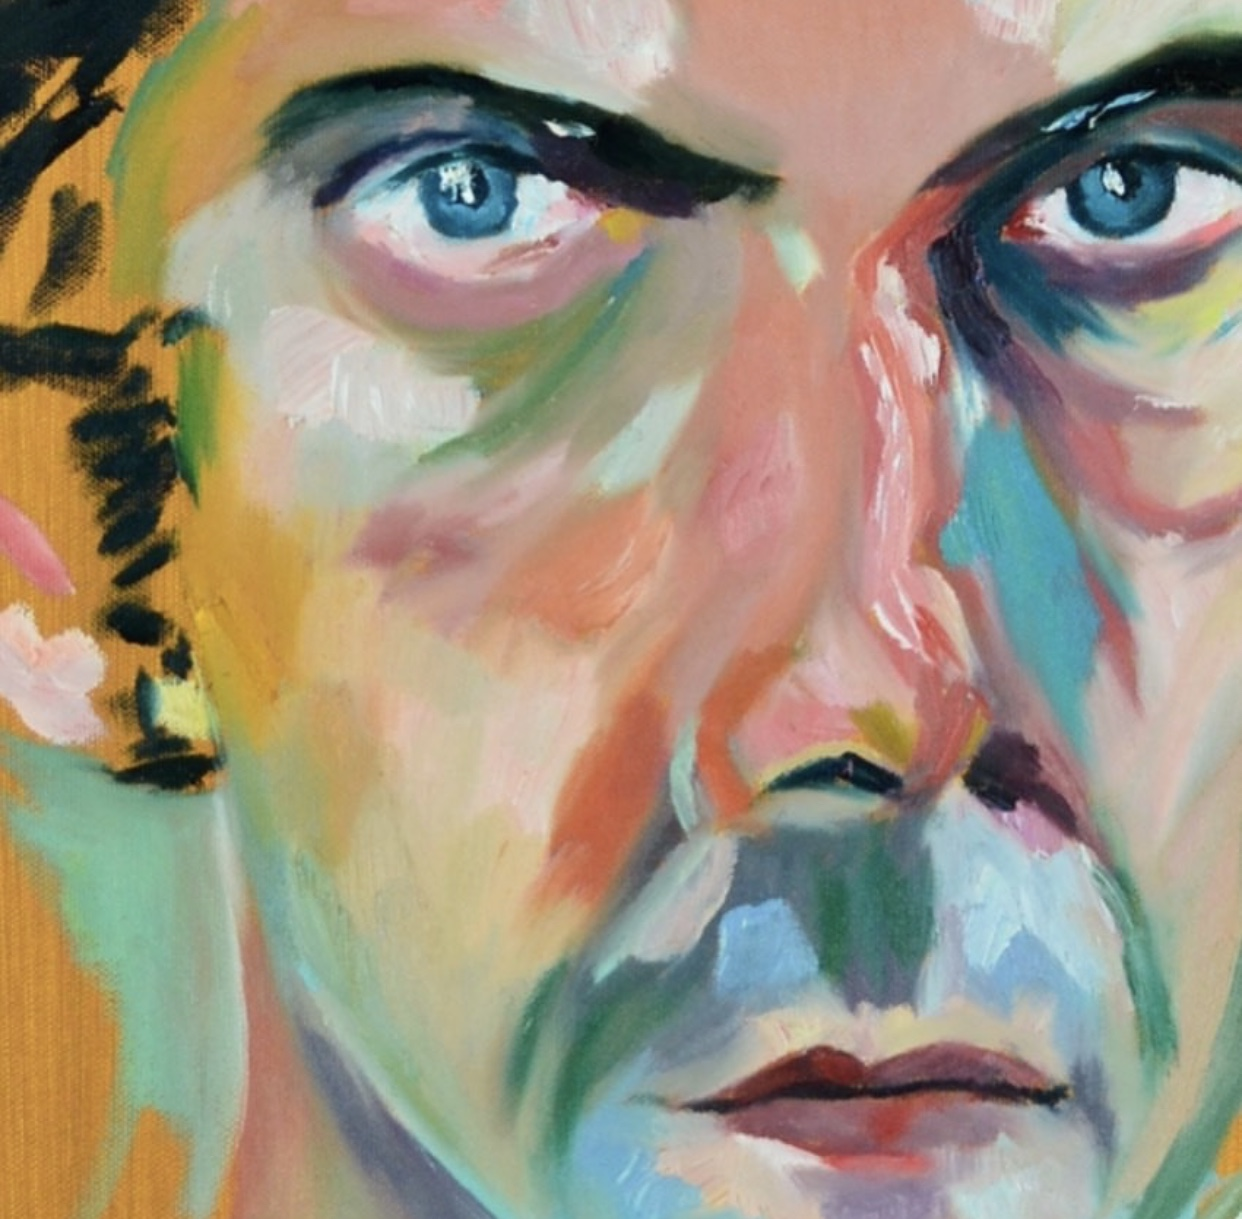 Portraits 2010 — Vern (detail)